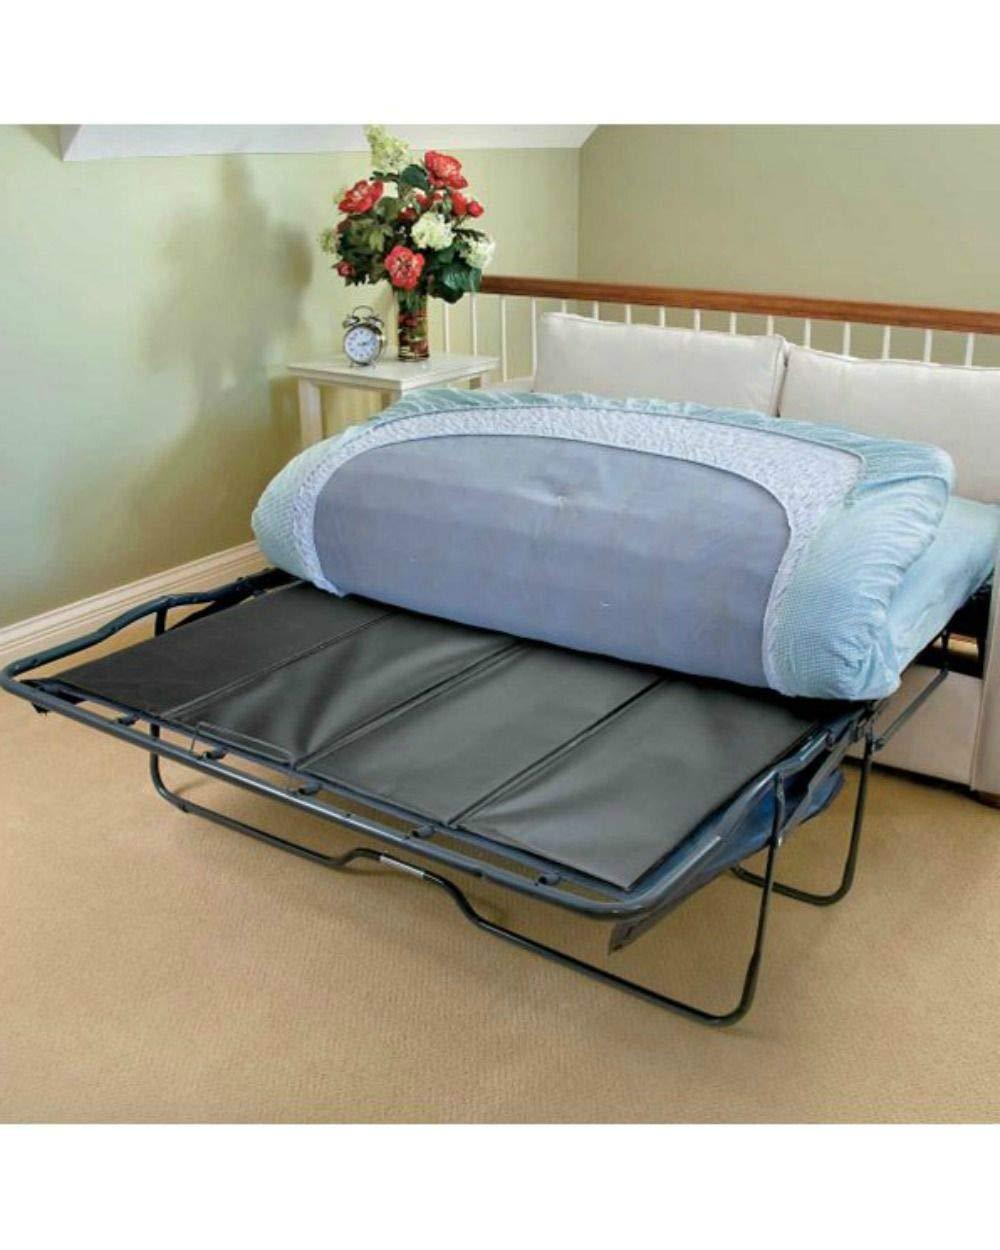 SRETAN Sofa Bed Bar Shield Black BLue Wood Composites PVC Sleeper Folding Support Board For Under Mattresses Living Room Twin Full Queen Size 48-60 x 28-60 x 0.25 inch (Full Open: 48 x 48 x 0.25 inch) by SRETAN